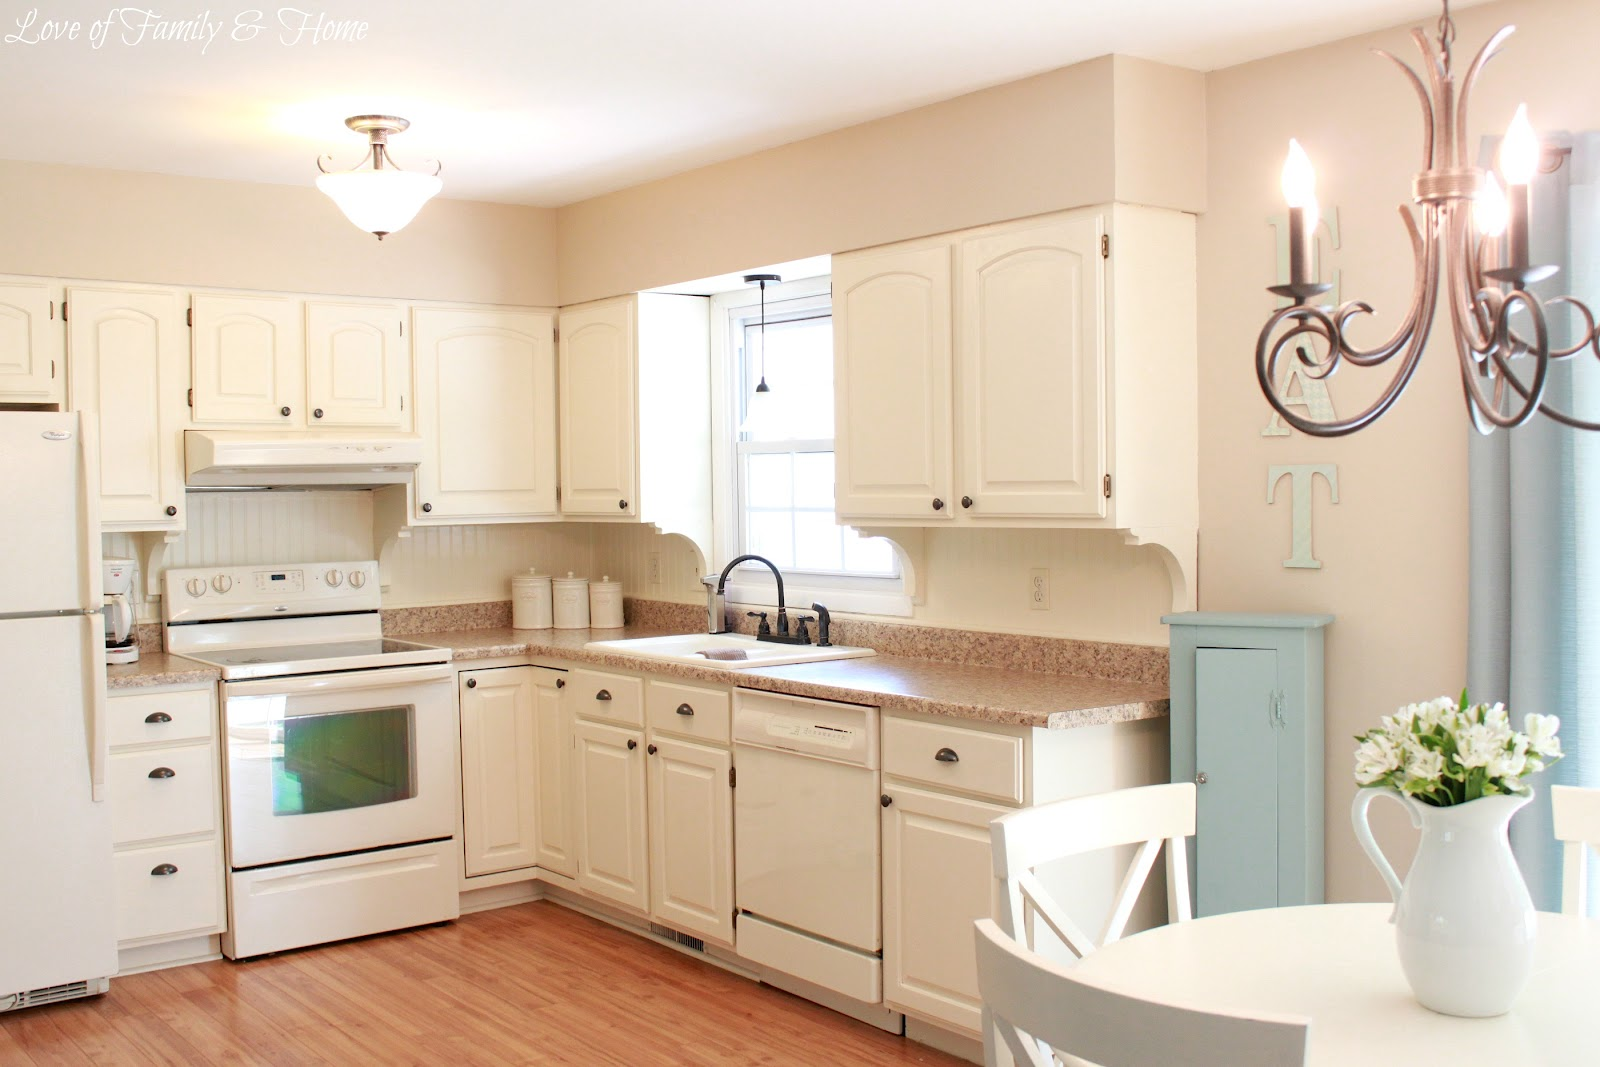 Beadboard Backsplash, Corbel Love, & A Few Other Kitchen ...